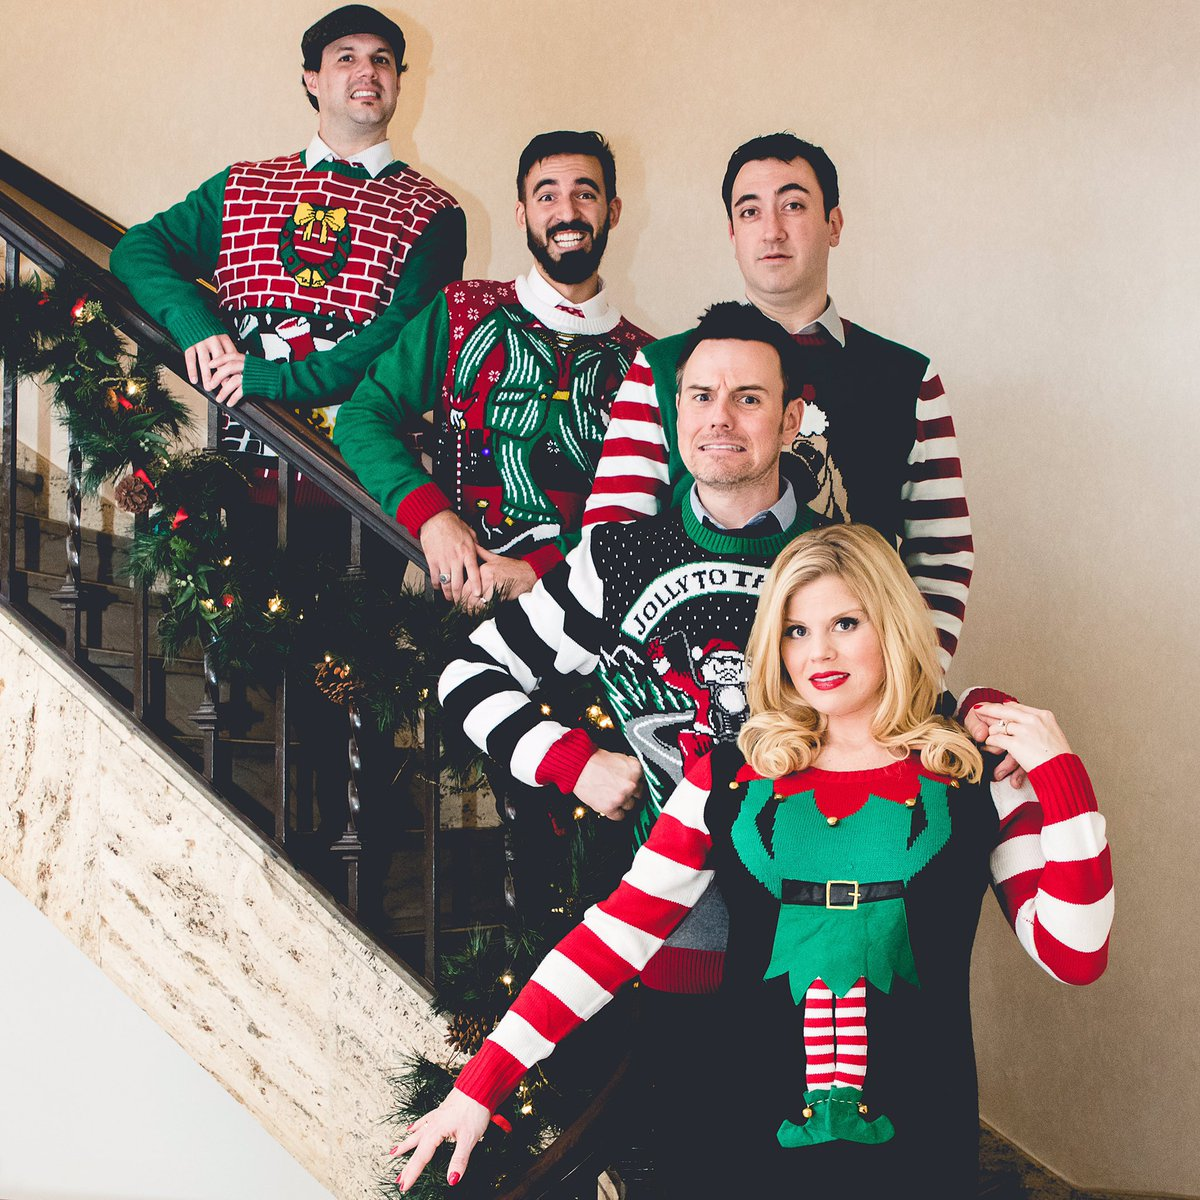 Things will get awkward this weekend at @FeinsteinsSF ! Fri-Sun #ChristmasTour2016 #AMerryLittleChristmas https://t.co/QIKbQBPlIg